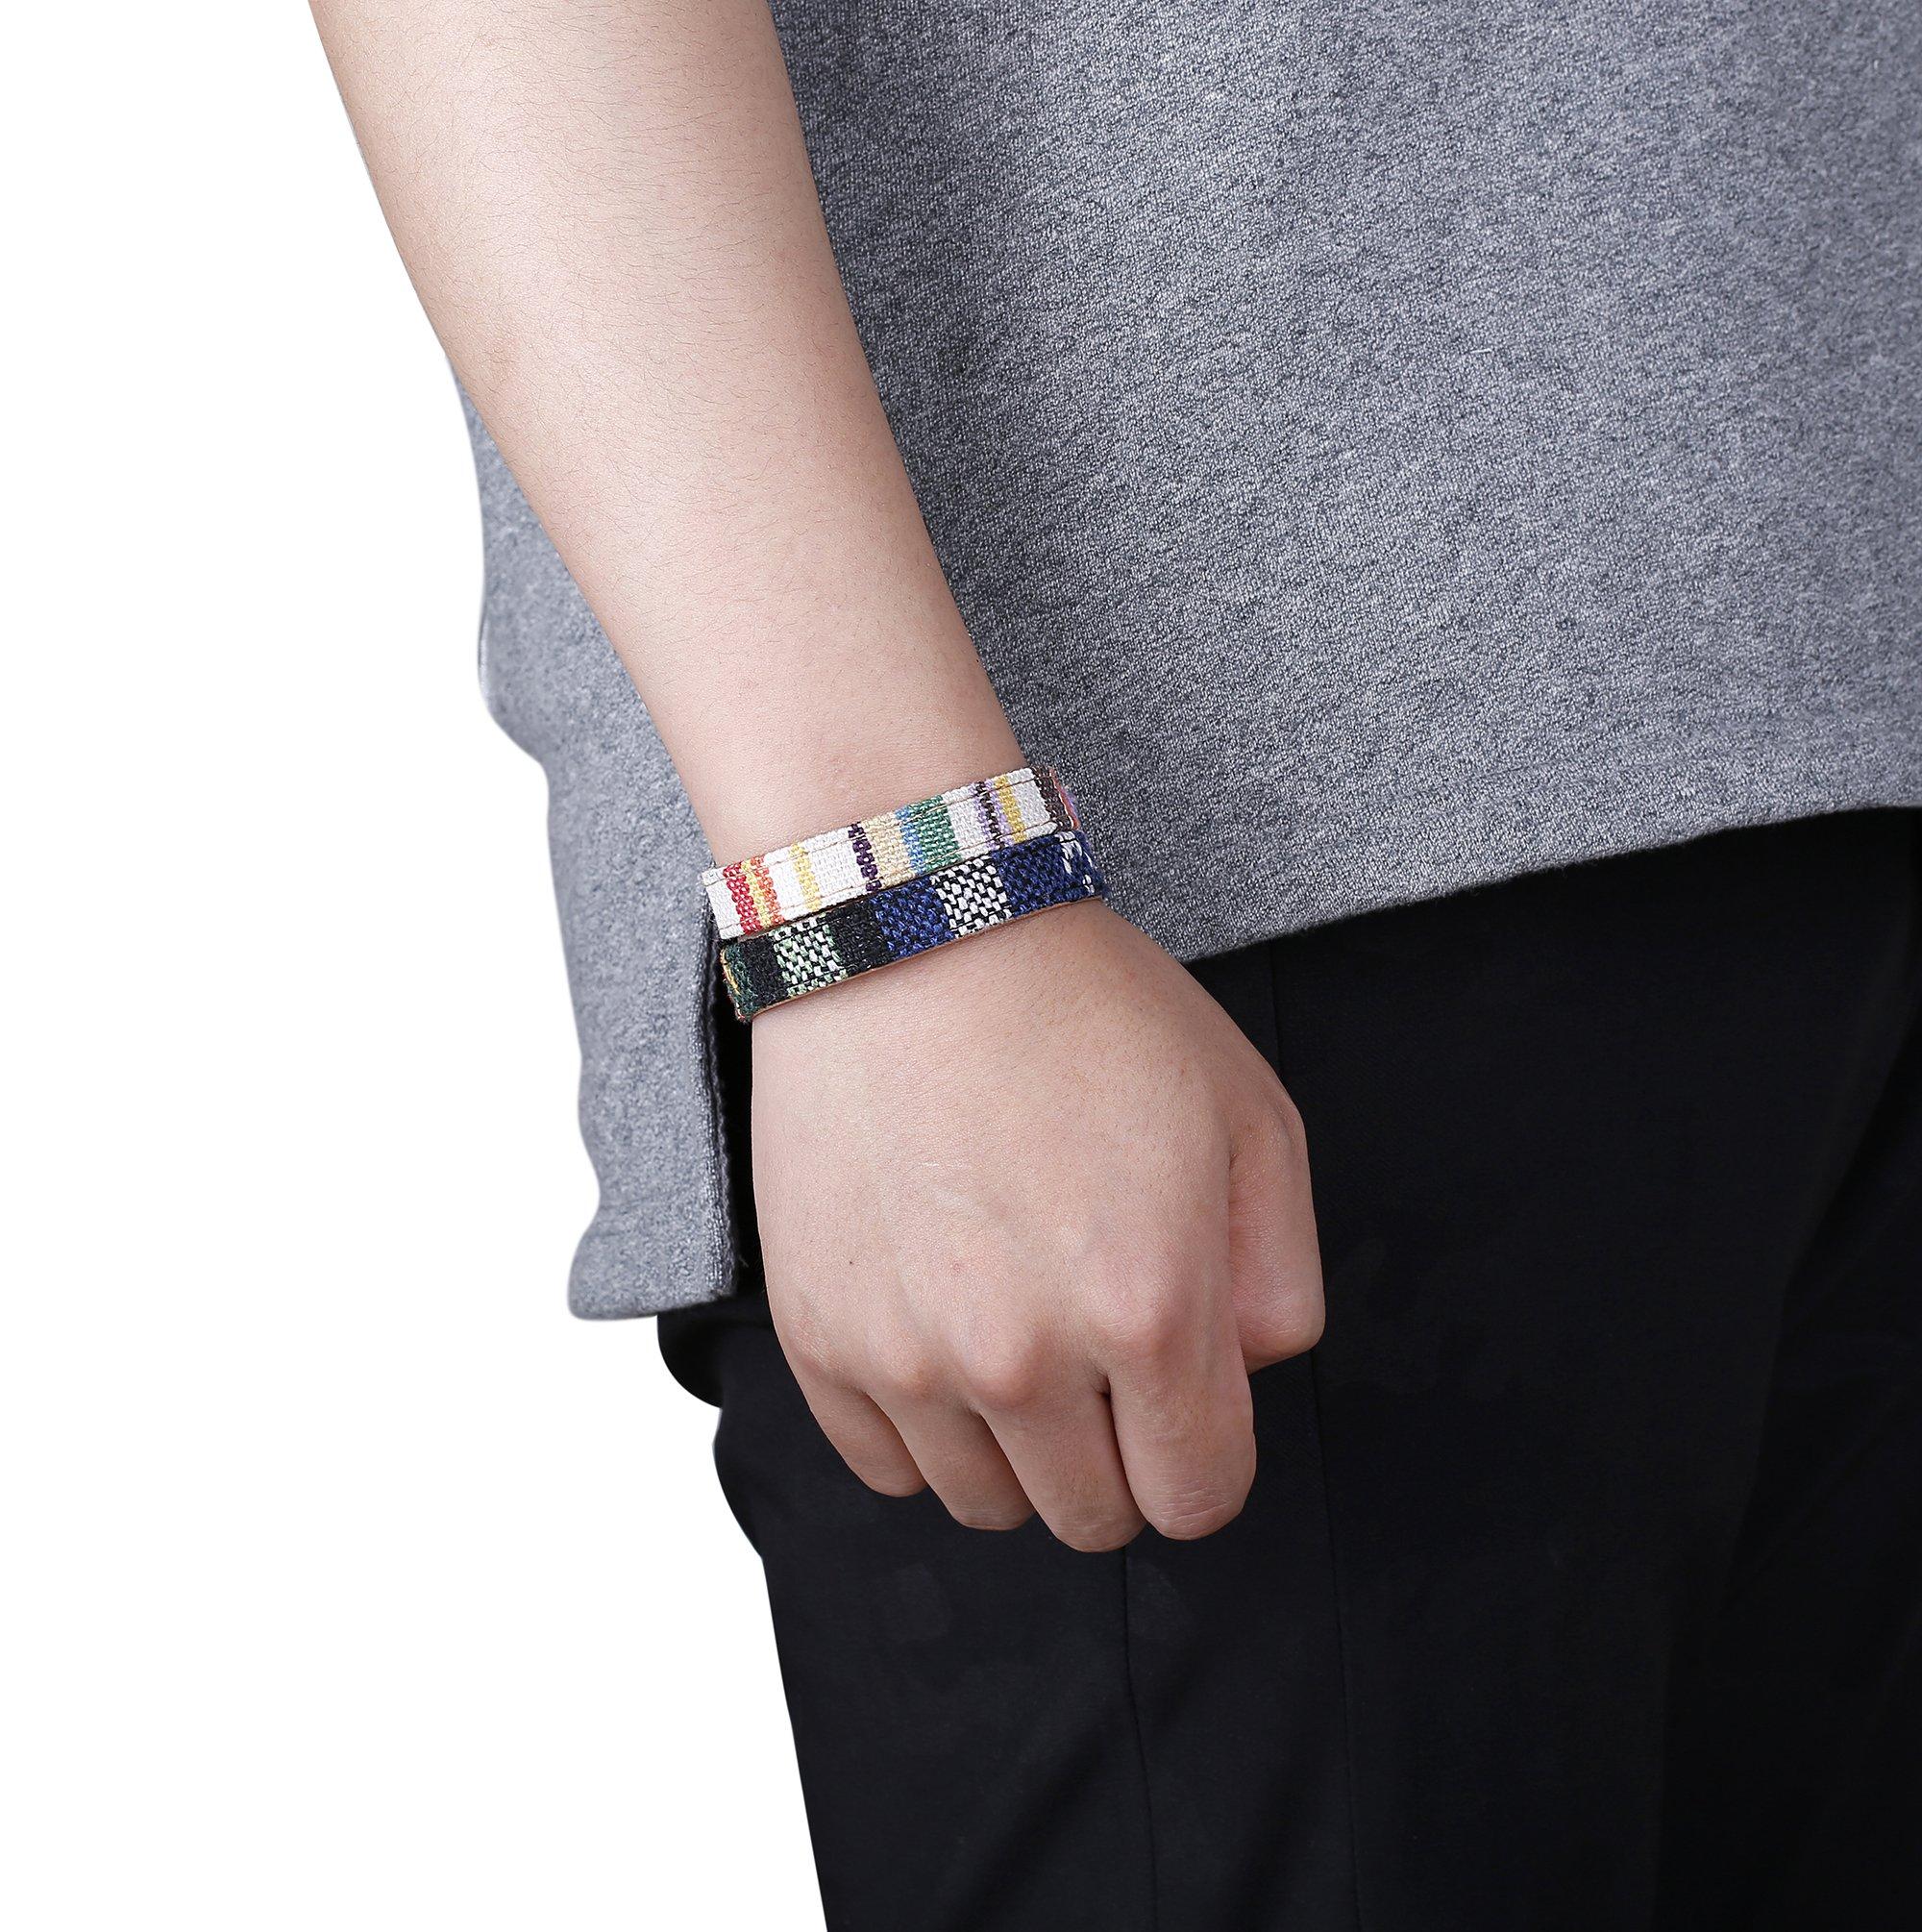 Jstyle 6-12Pcs Wrap Bracelets for Women Men Hemp Cords Ethnic Tribal Bracelet Wooden Beads Leather Bracelets Wristbands by Jstyle (Image #5)